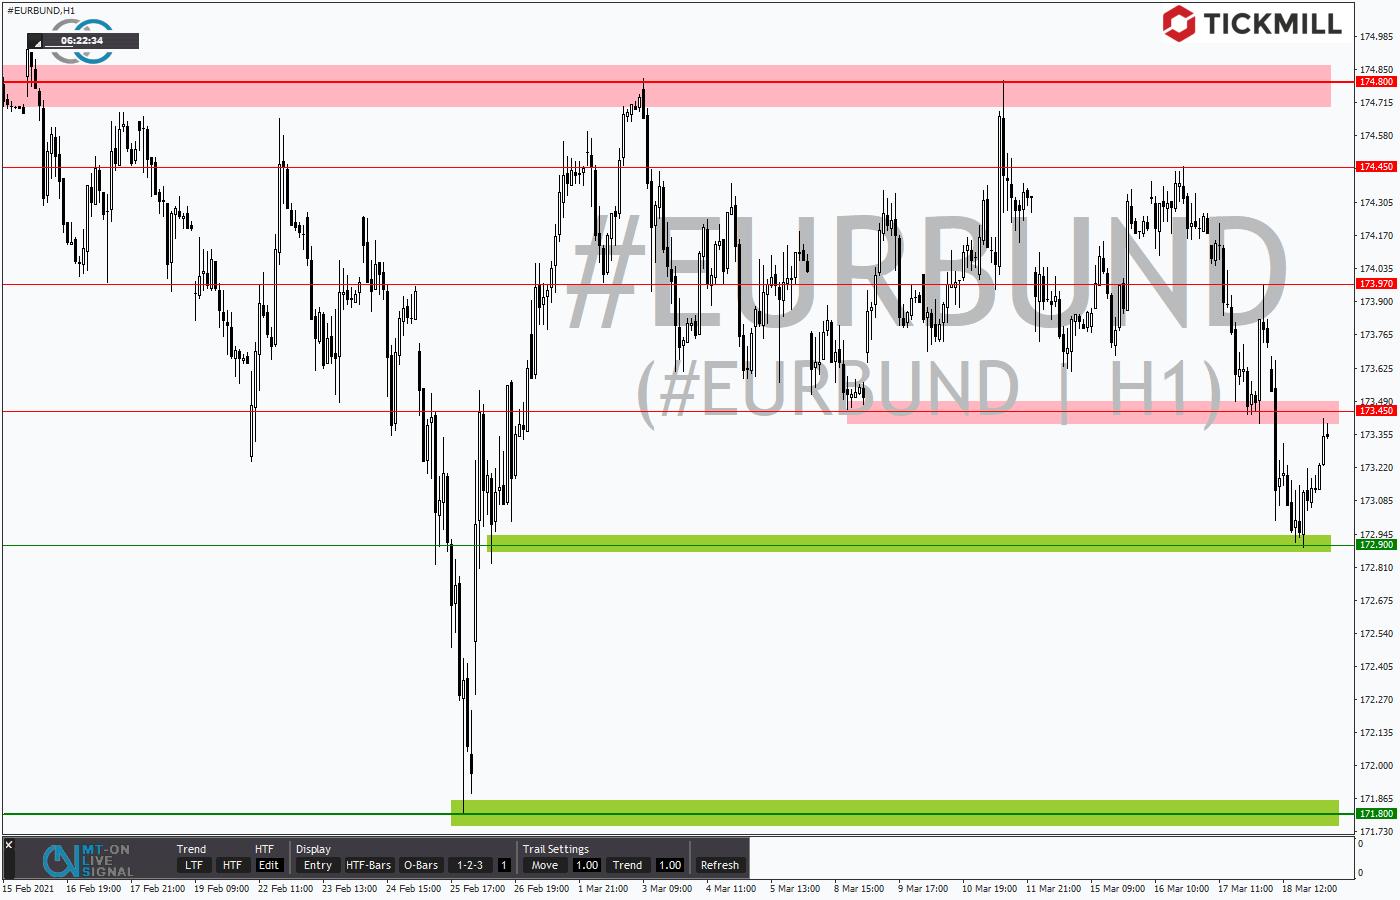 Tickmill-Analyse: EURBUND im Stundenchart